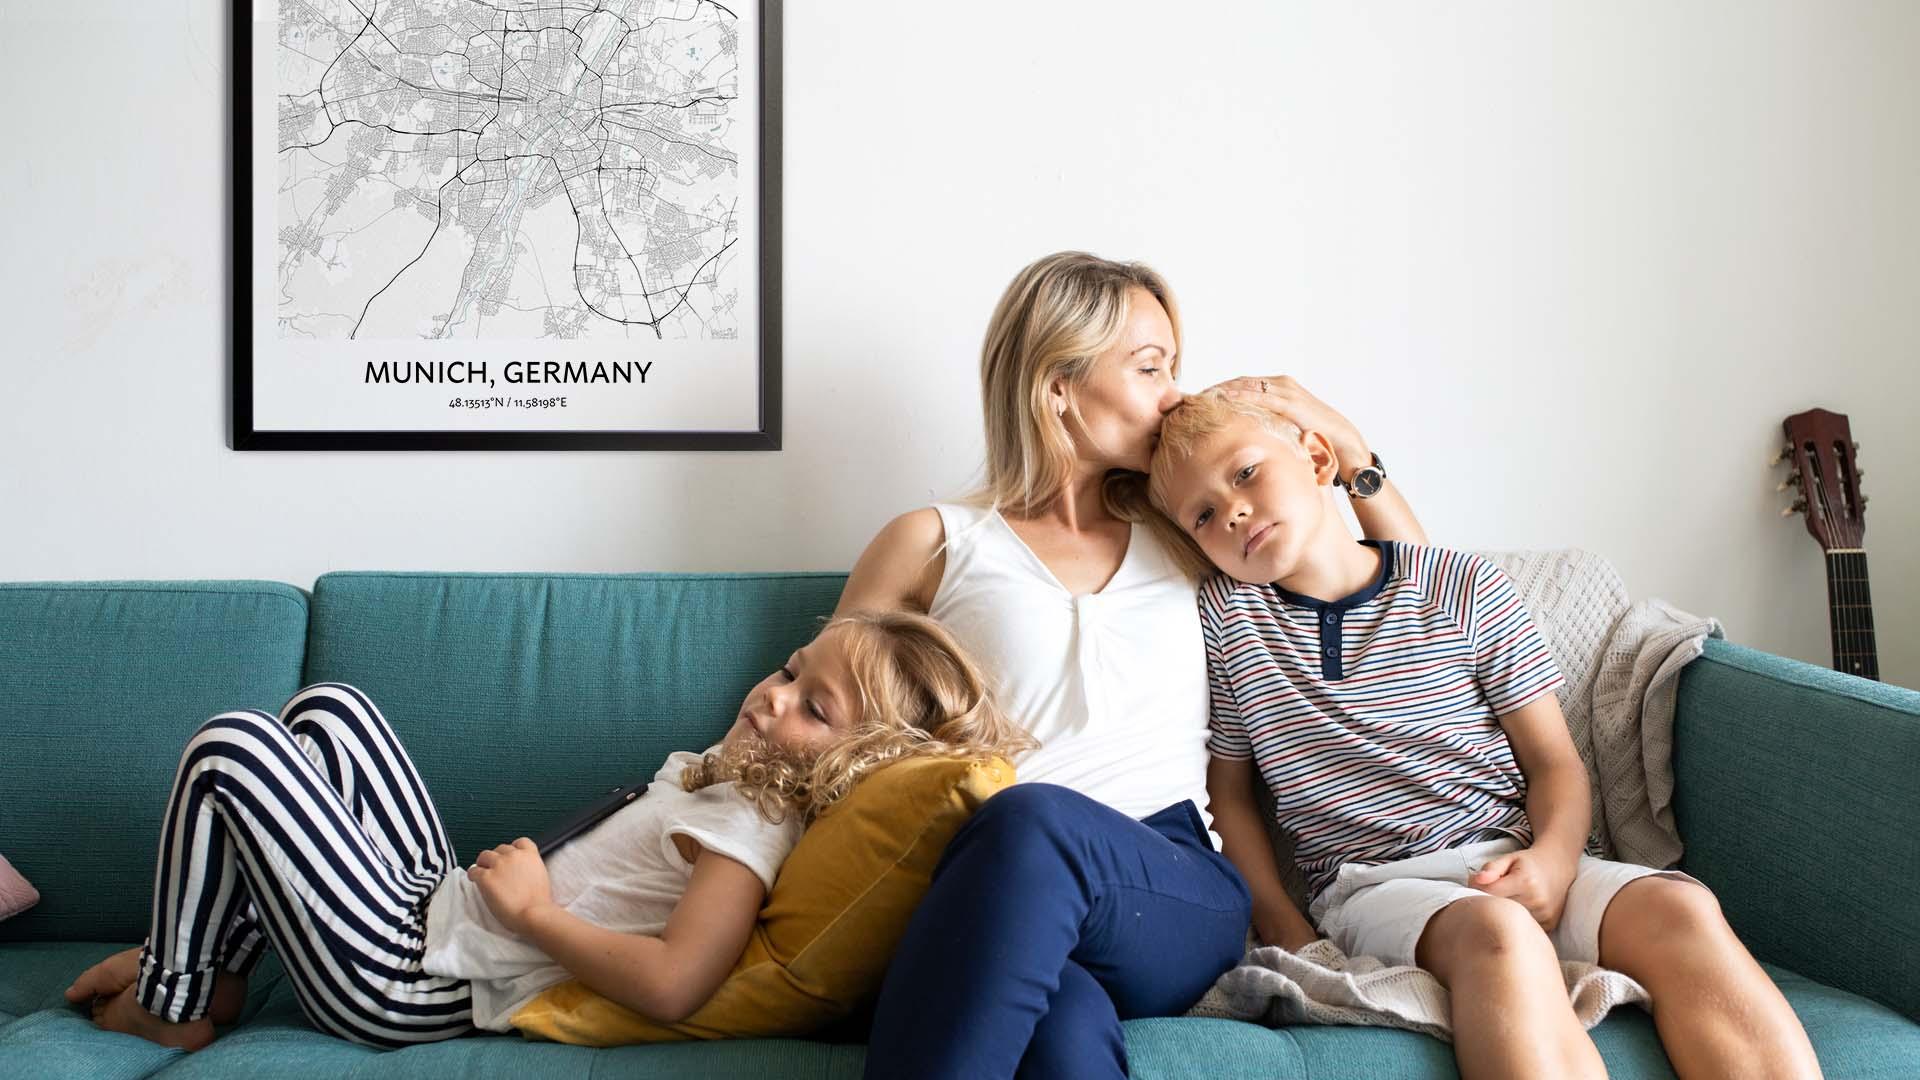 Munich map poster